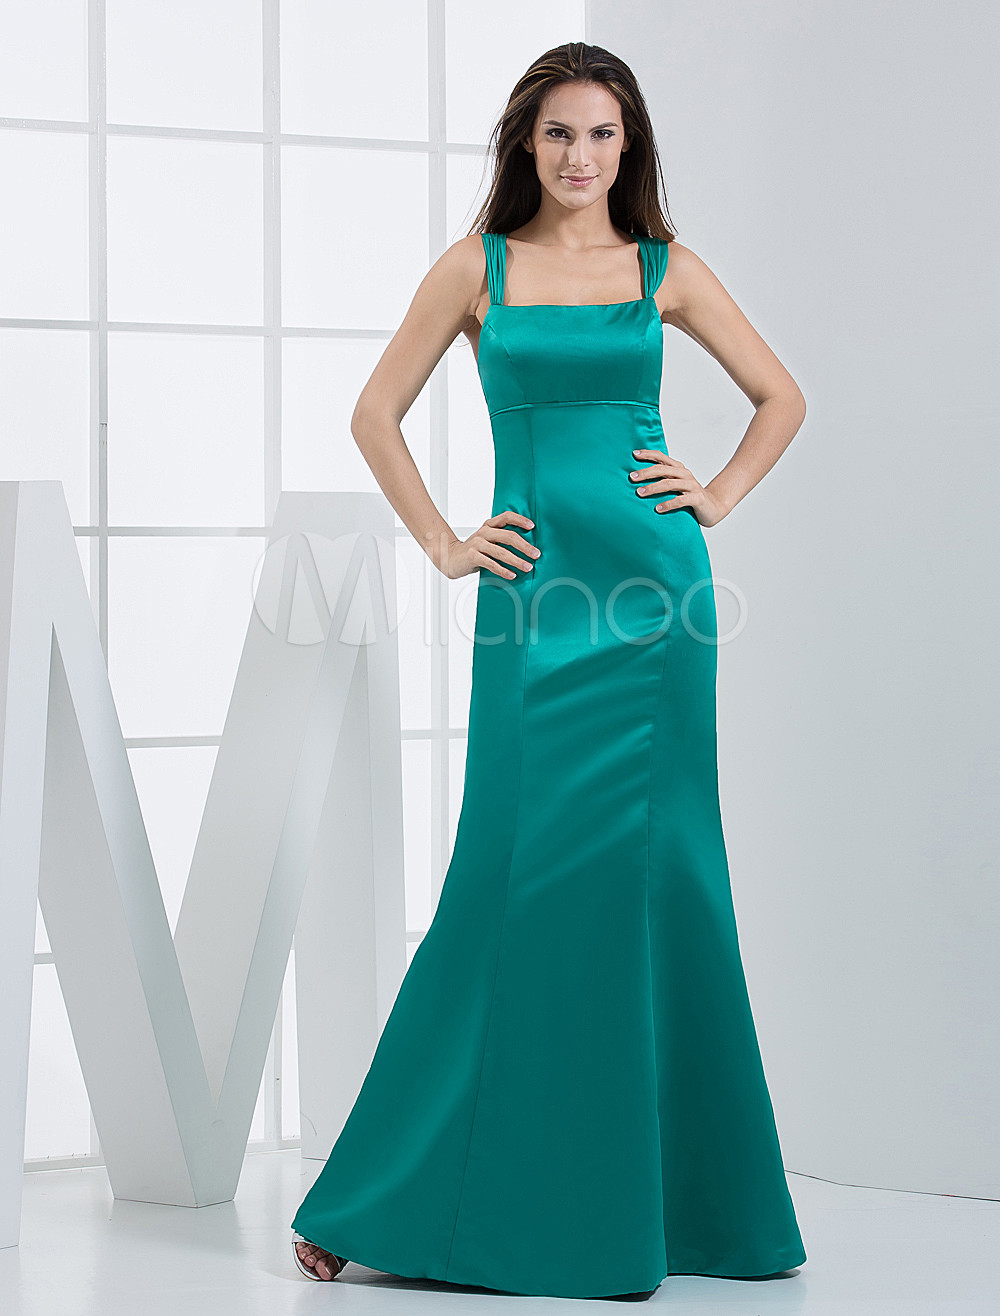 Mermaid Spaghetti Straps Hunter Green Satin Bridesmaid Dress